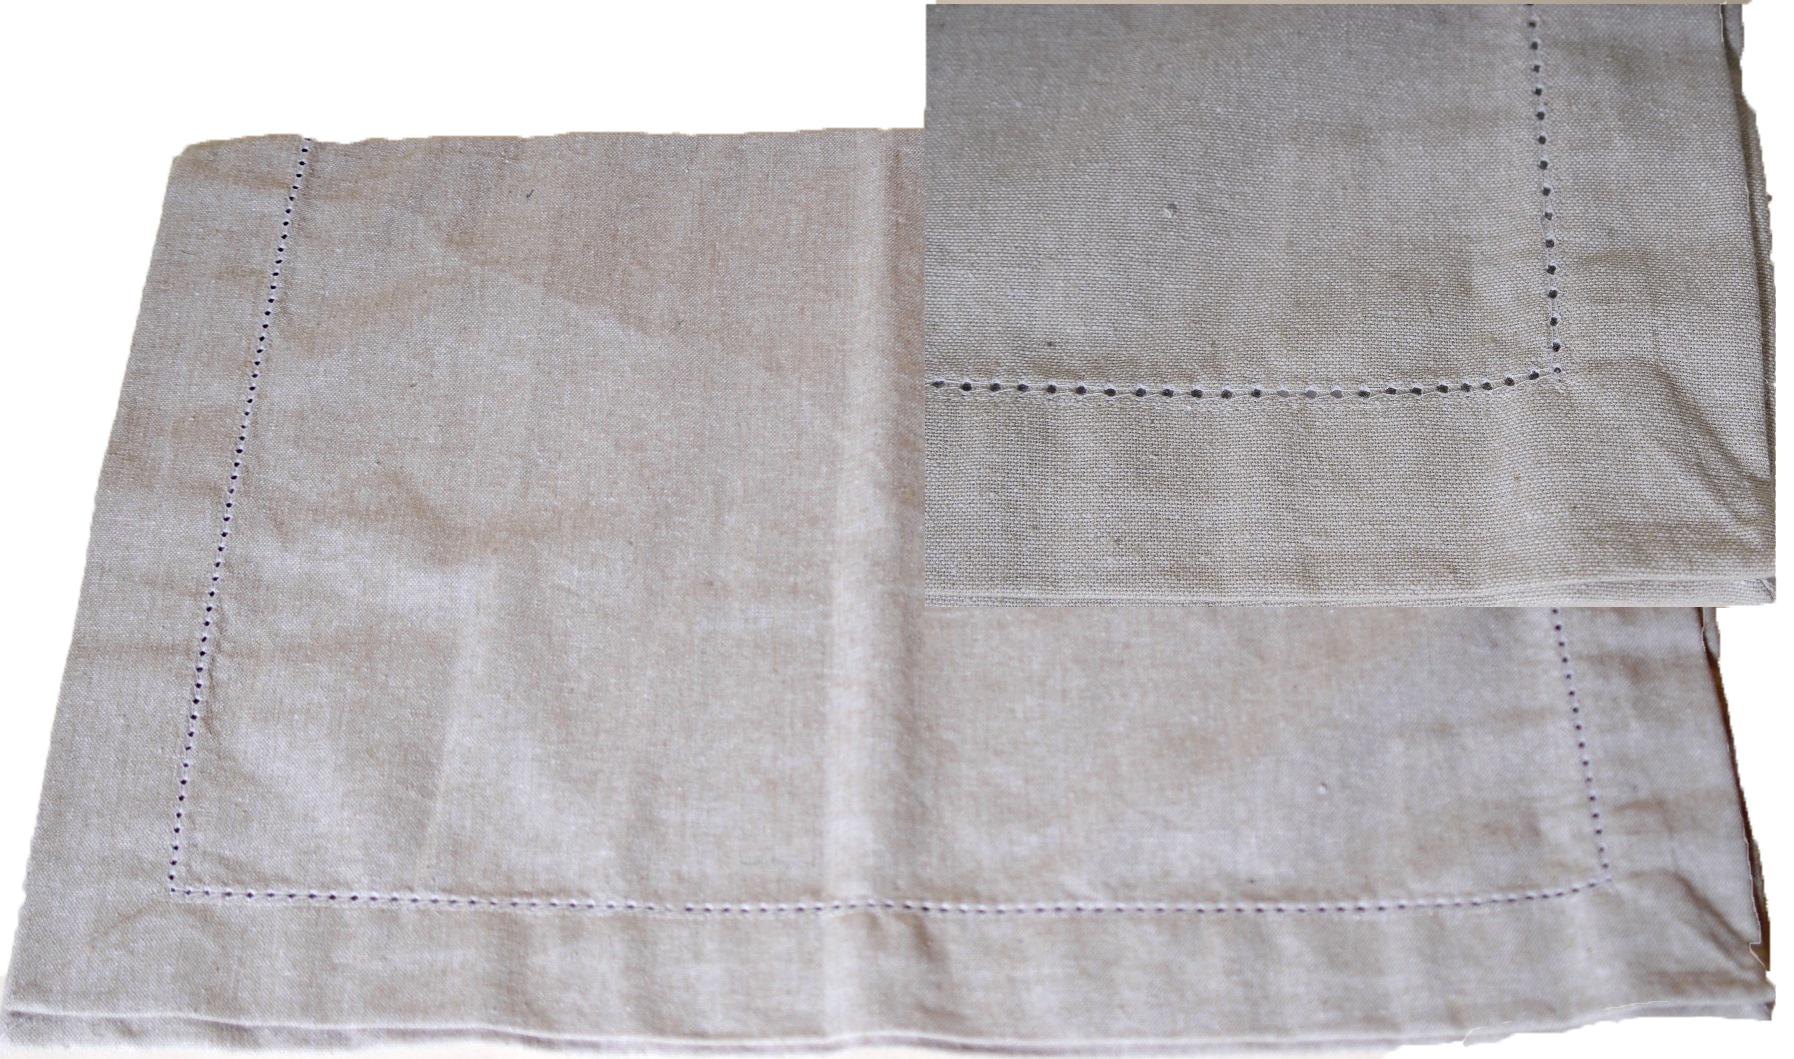 Runner Υφασμάτινο Royal Art 50×150εκ. STA62477WT (Χρώμα: Λευκό) – Royal Art Collection – STA62477WT